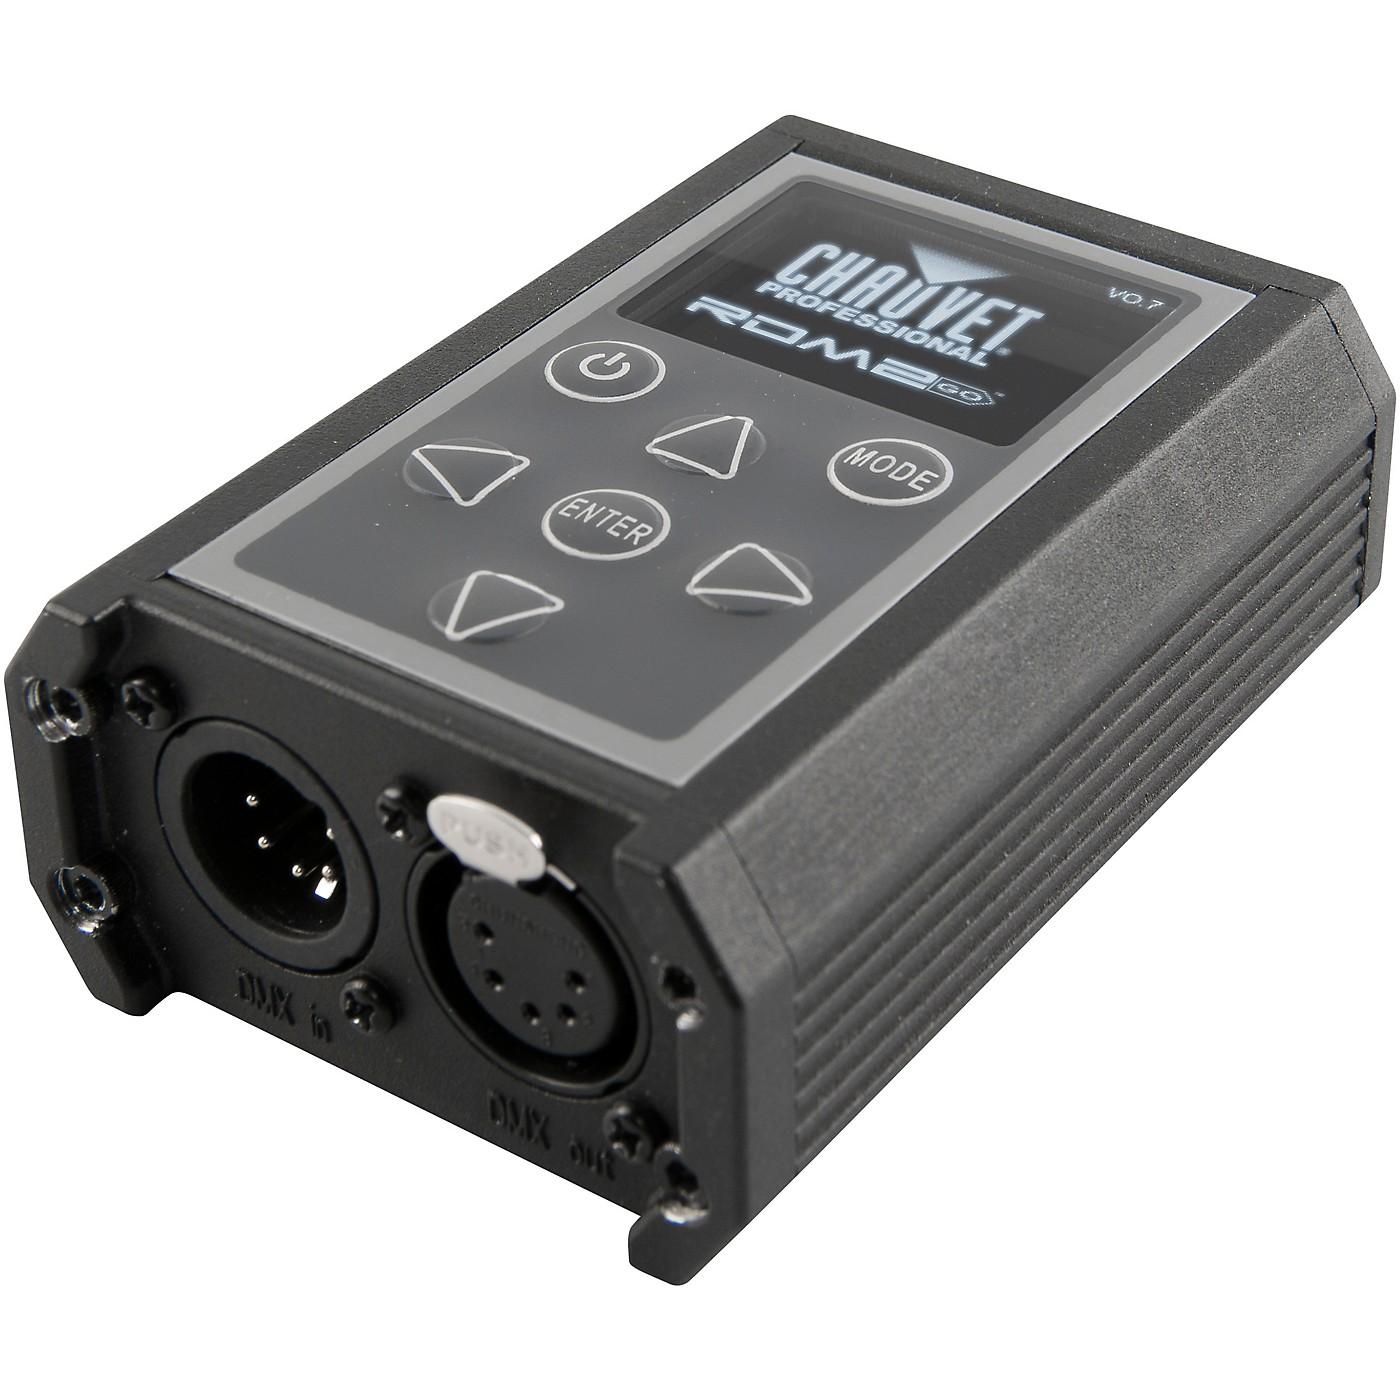 CHAUVET Professional RDM2go DMX / RDM Lighting Configuration Testing Tool thumbnail